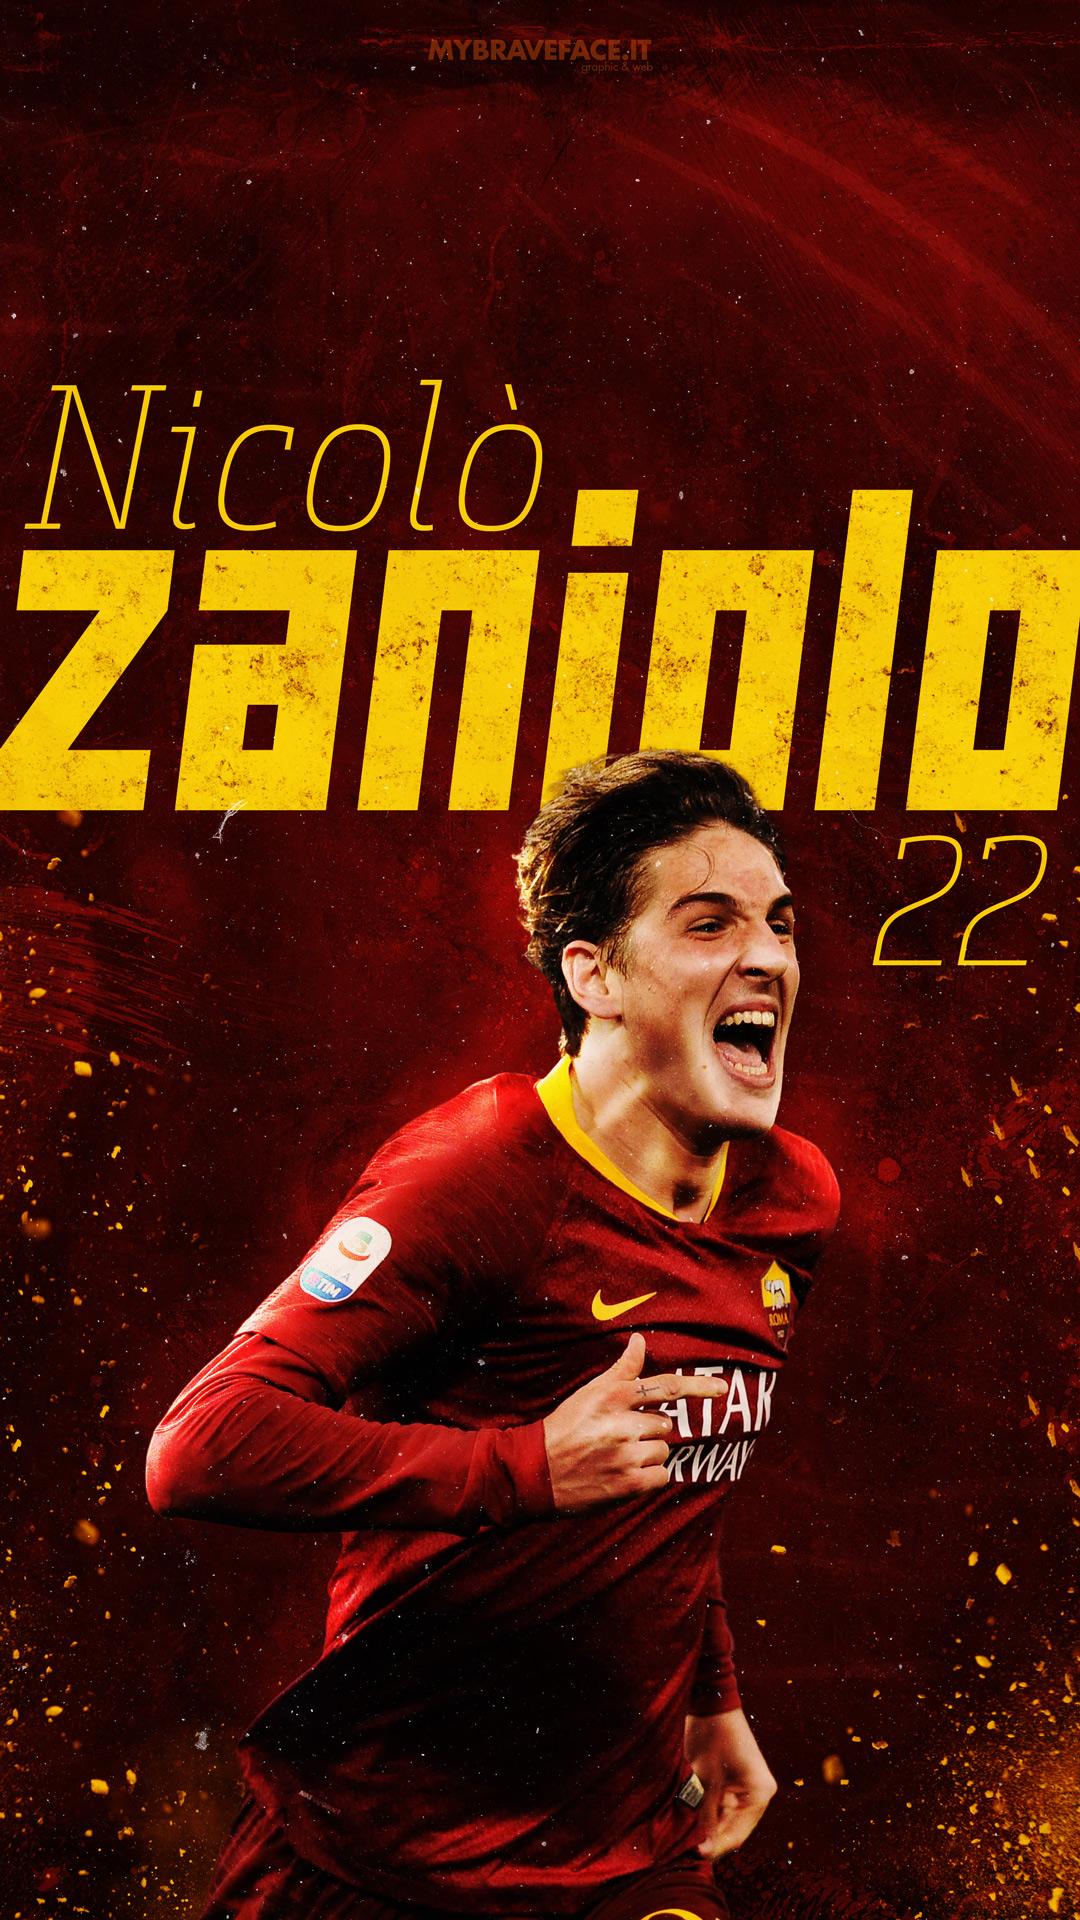 Nicolò Zaniolo Wallpaper Lockscreen